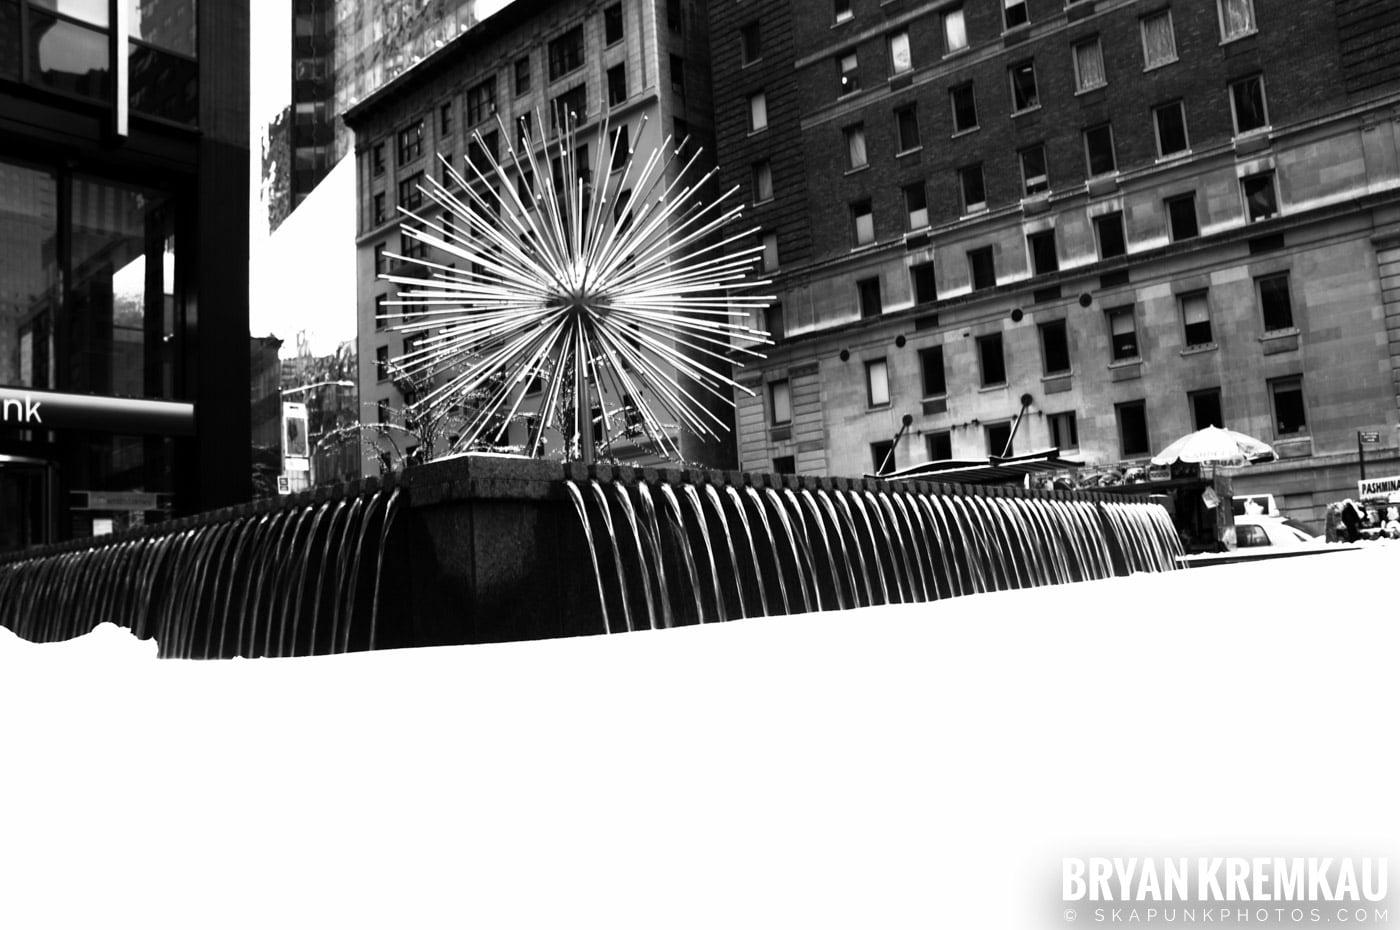 NYC Holiday Trip - 12.20.08 (40)